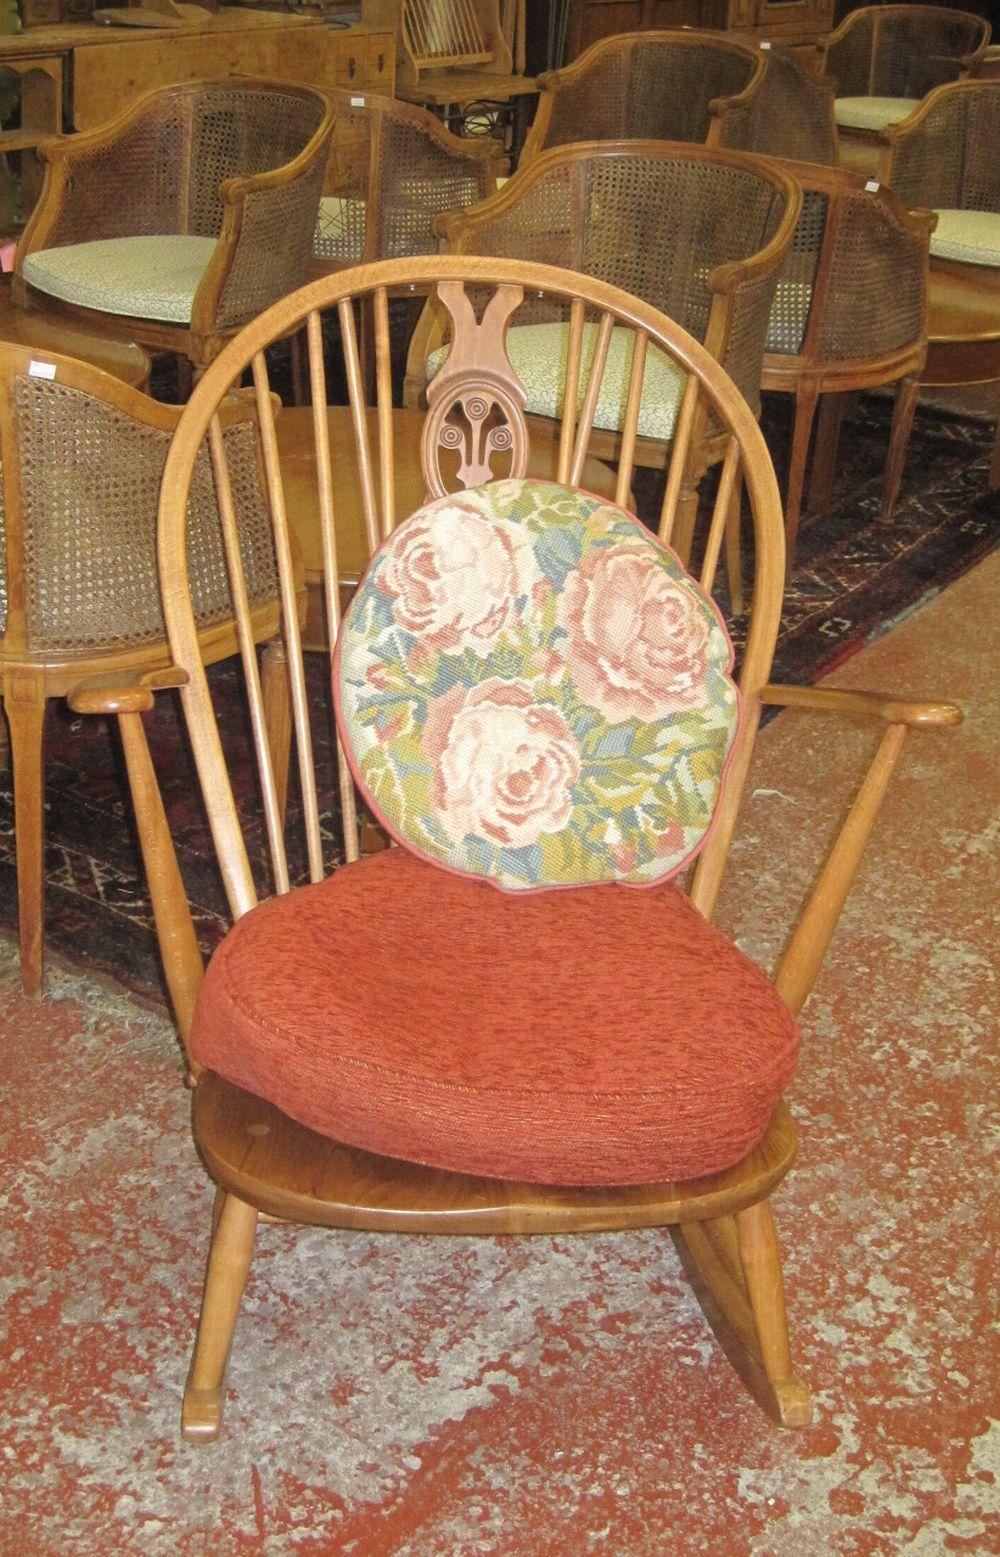 An Ercol Windsor rocking chair